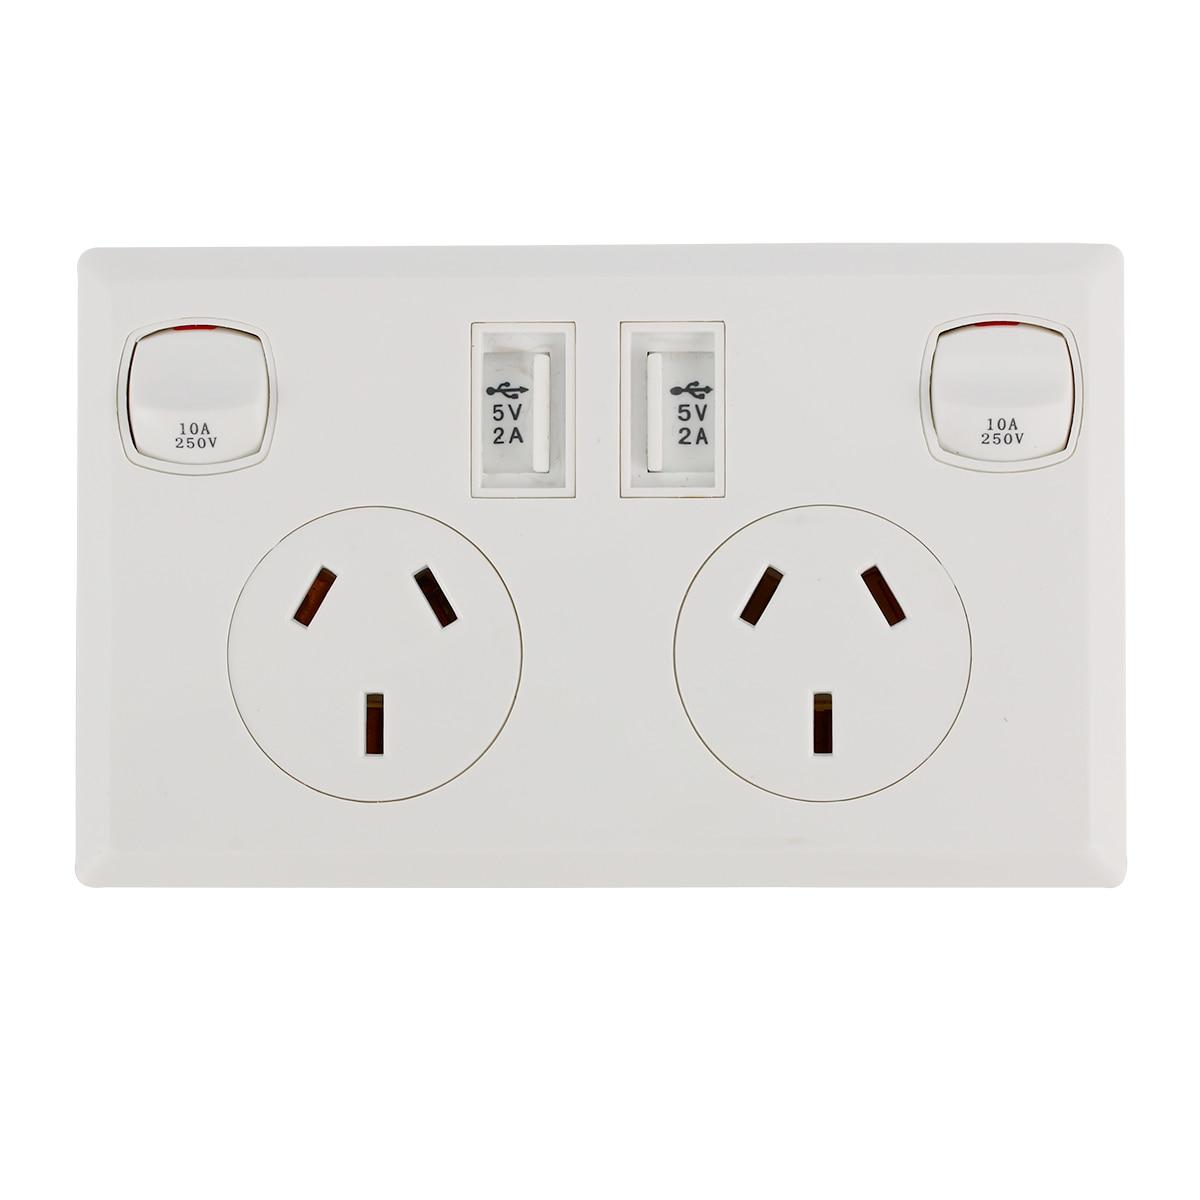 n power plug wiring n image 240v wiring diagram 240v image wiring on n power plug wiring